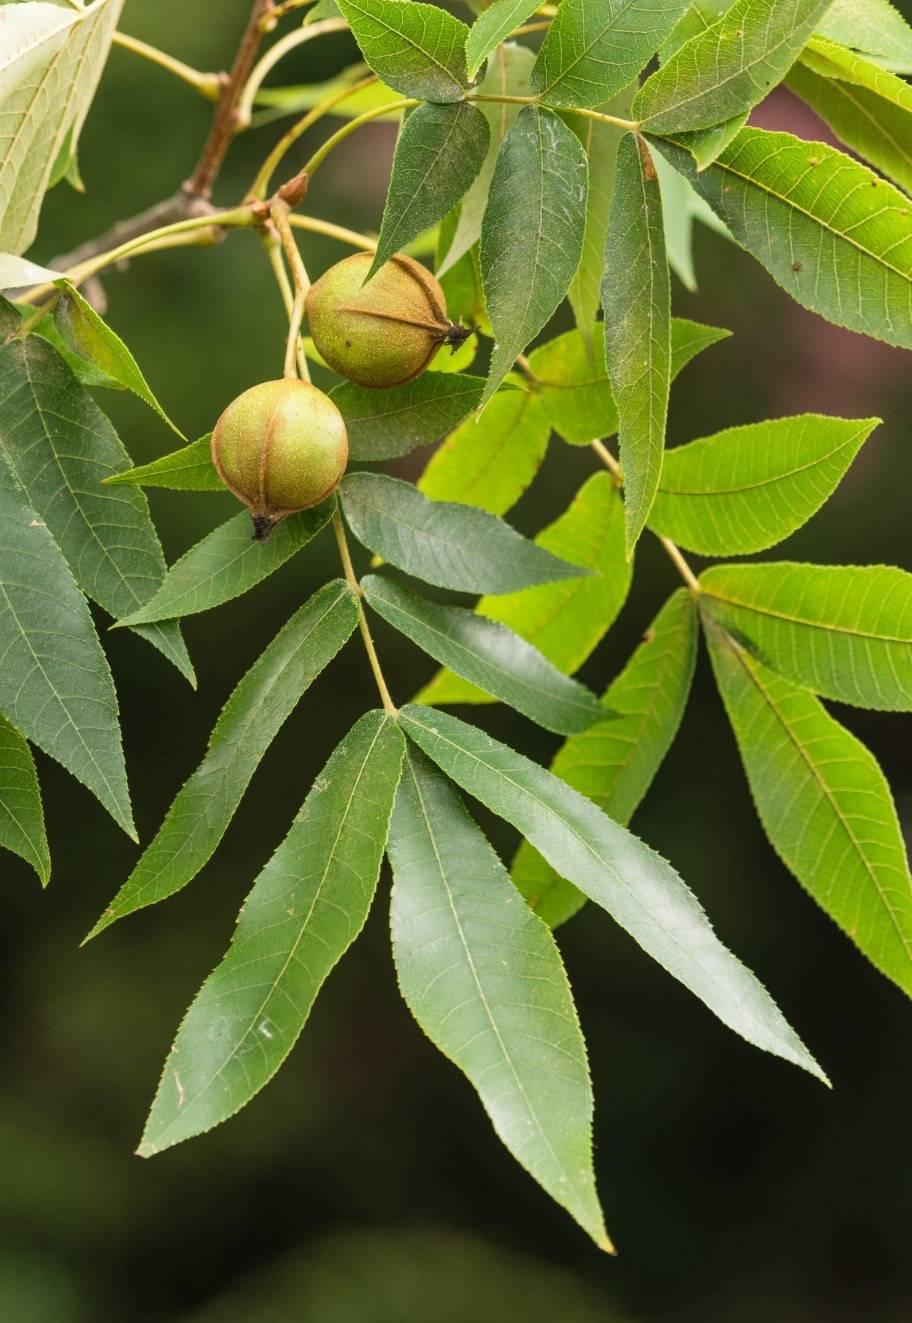 Кирказон: посадка и уход, выращивание из семян, виды